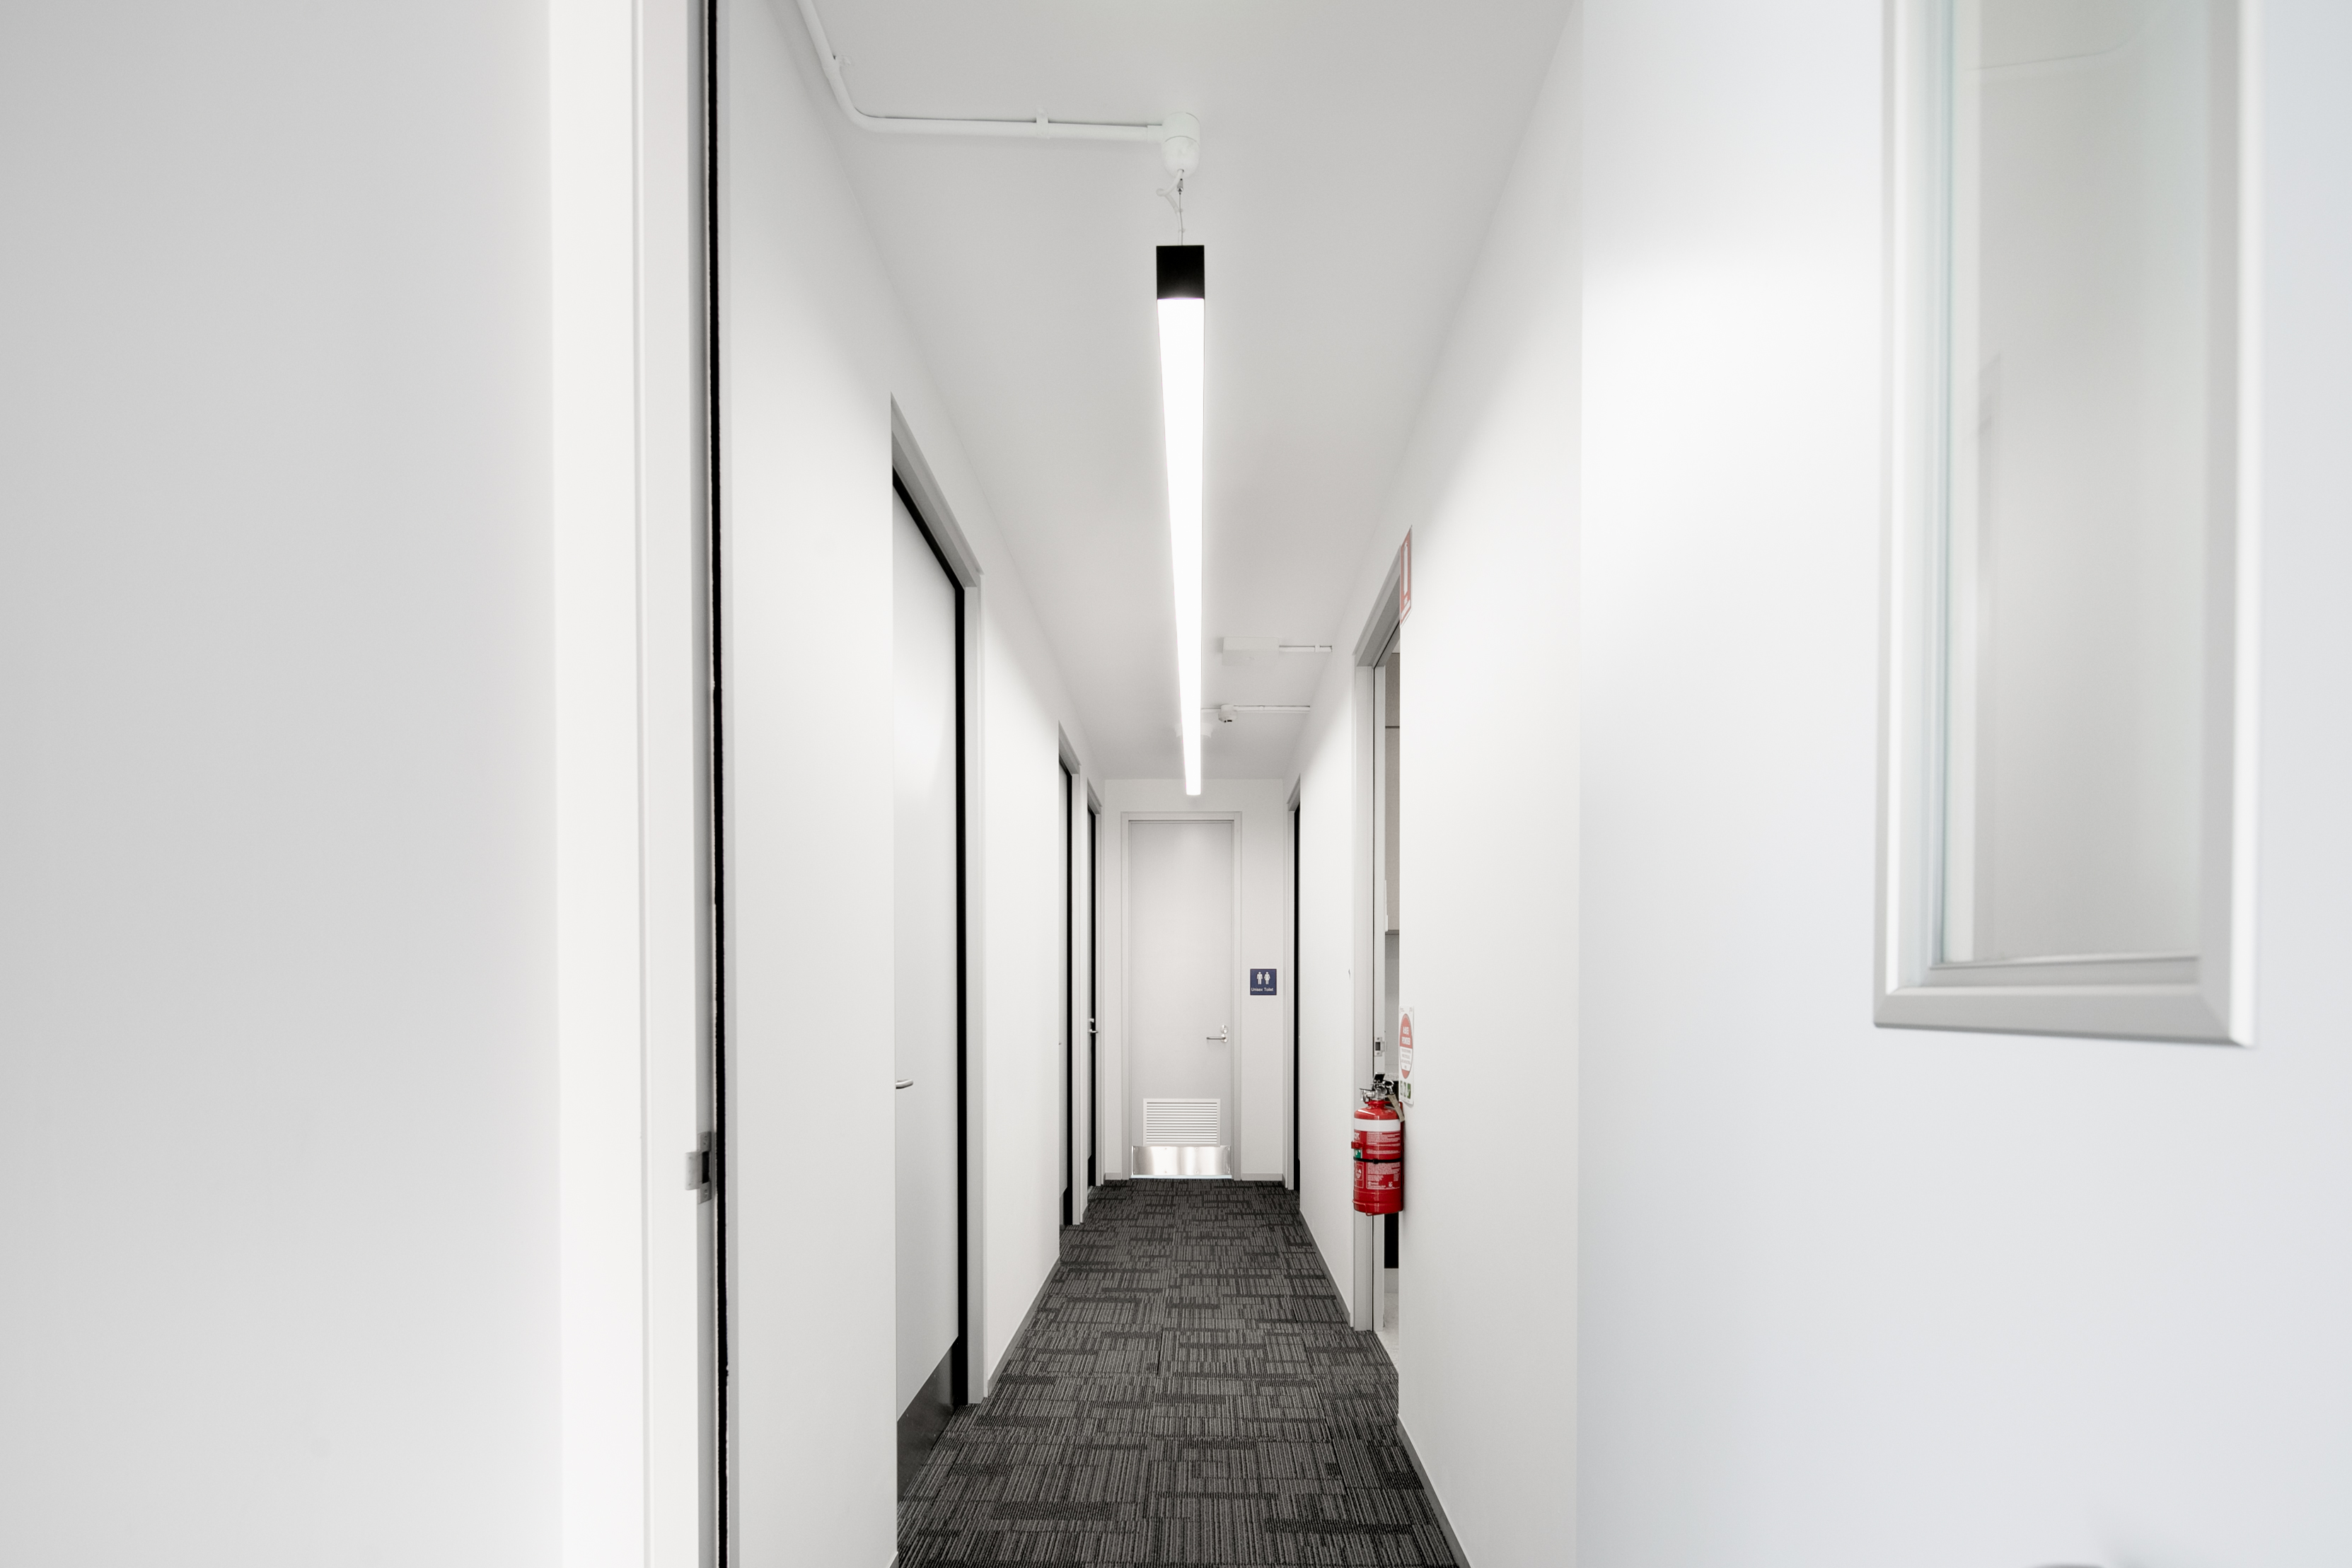 lane-cove-community-space-avant-constructions-gez-xavier-mansfield-photography-2018-153